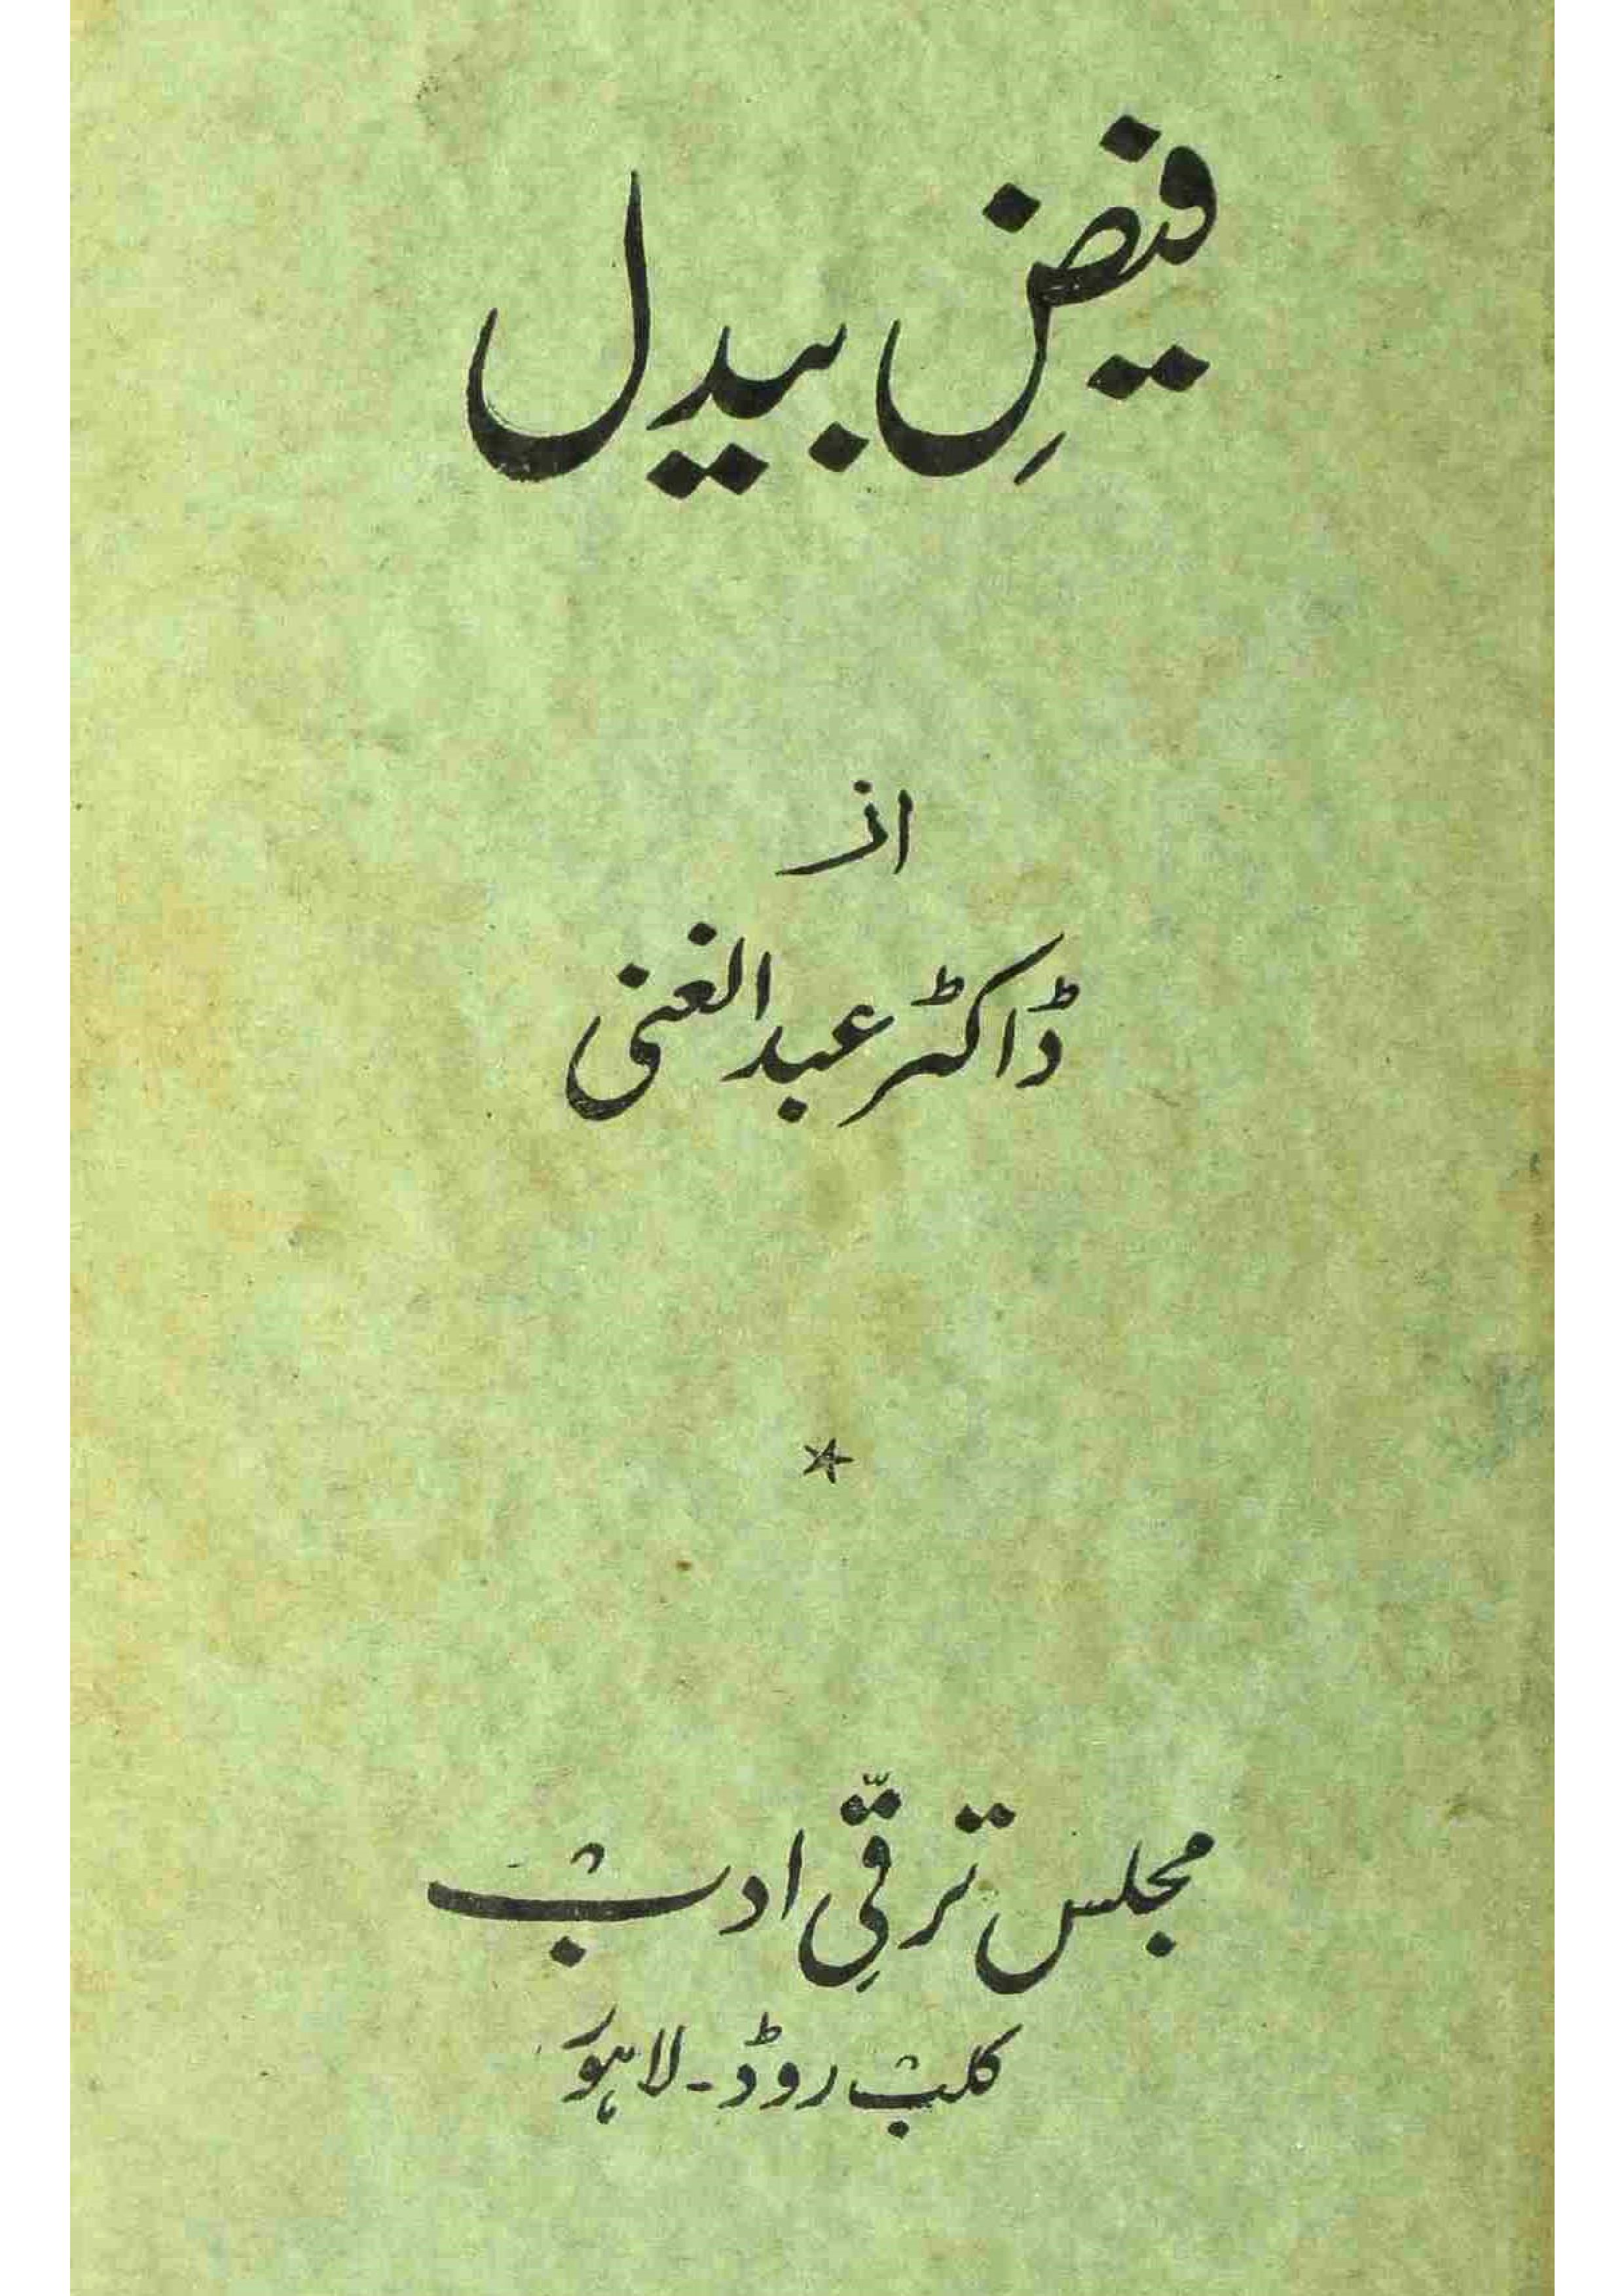 Faiz-e-Bedil